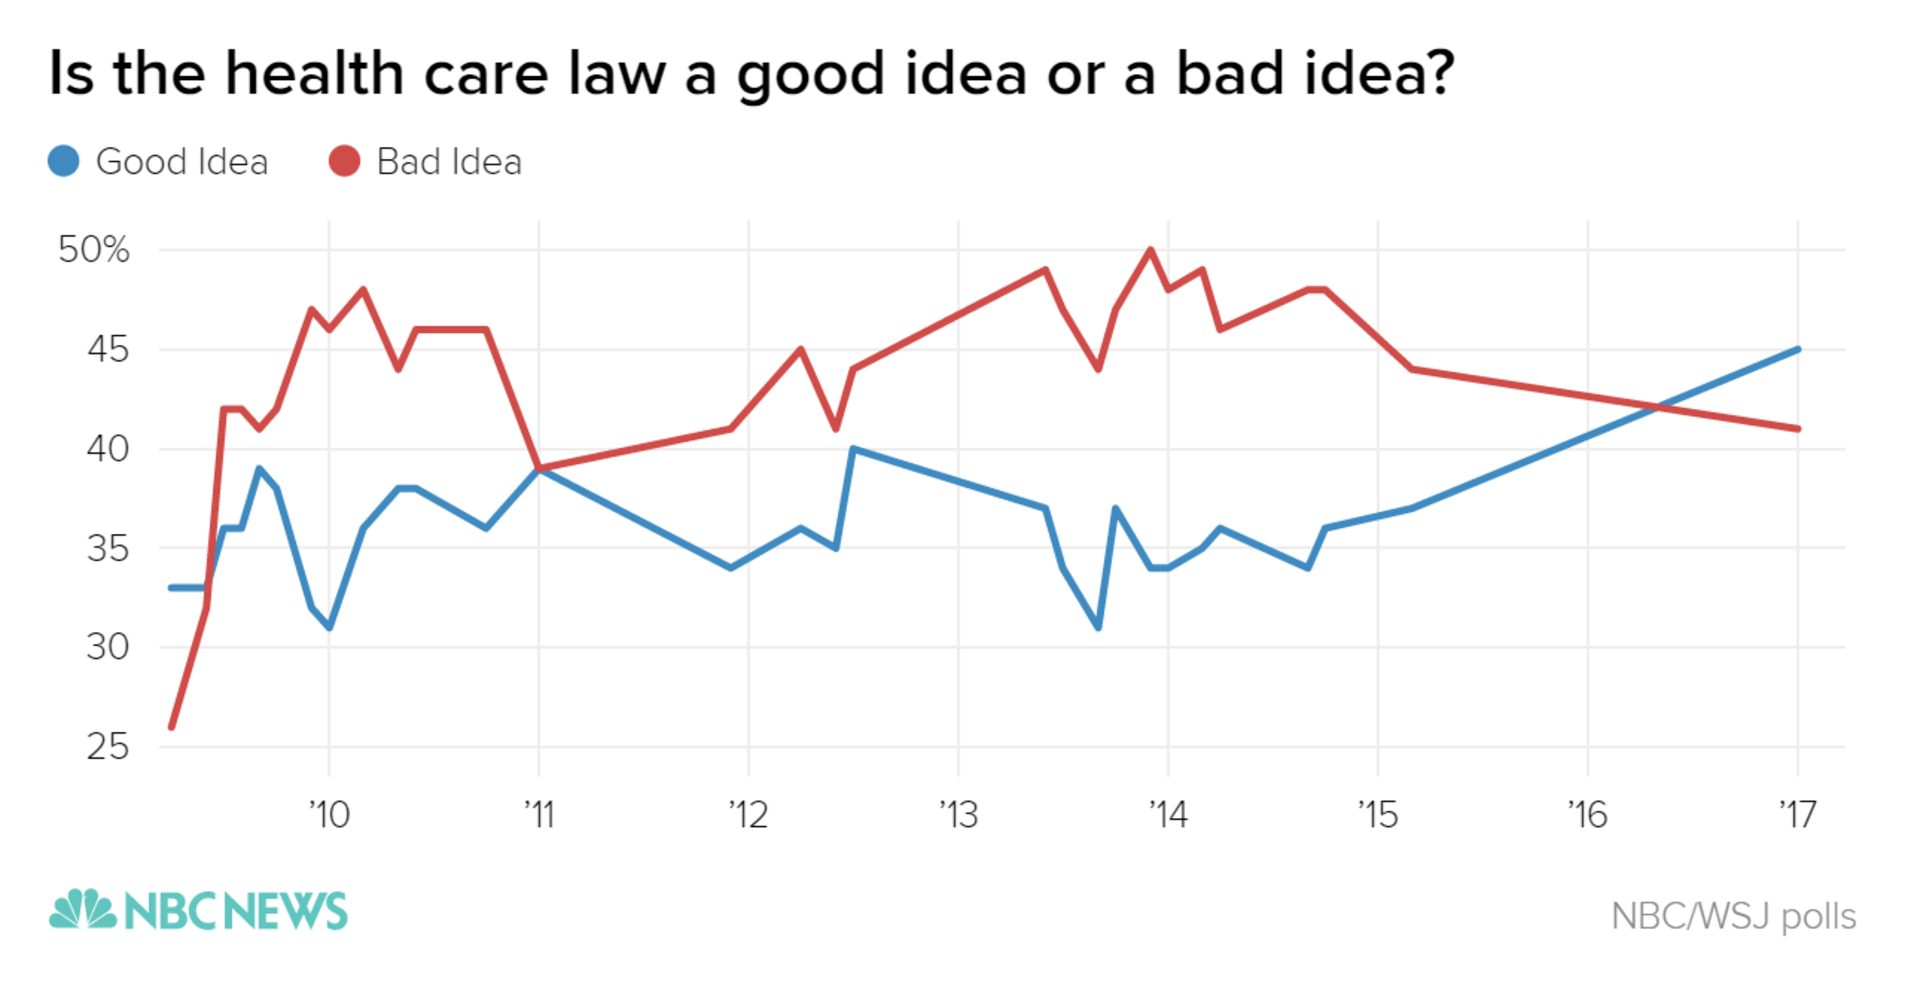 http://media2.s-nbcnews.com/j/newscms/2017_03/1867921/is_the_health_care_law_a_good_idea_or_a_bad_idea-_good_idea_bad_idea_chartbuilder_fb79b533e7652747e53c1a586677c6f3.nbcnews-ux-2880-1000.png